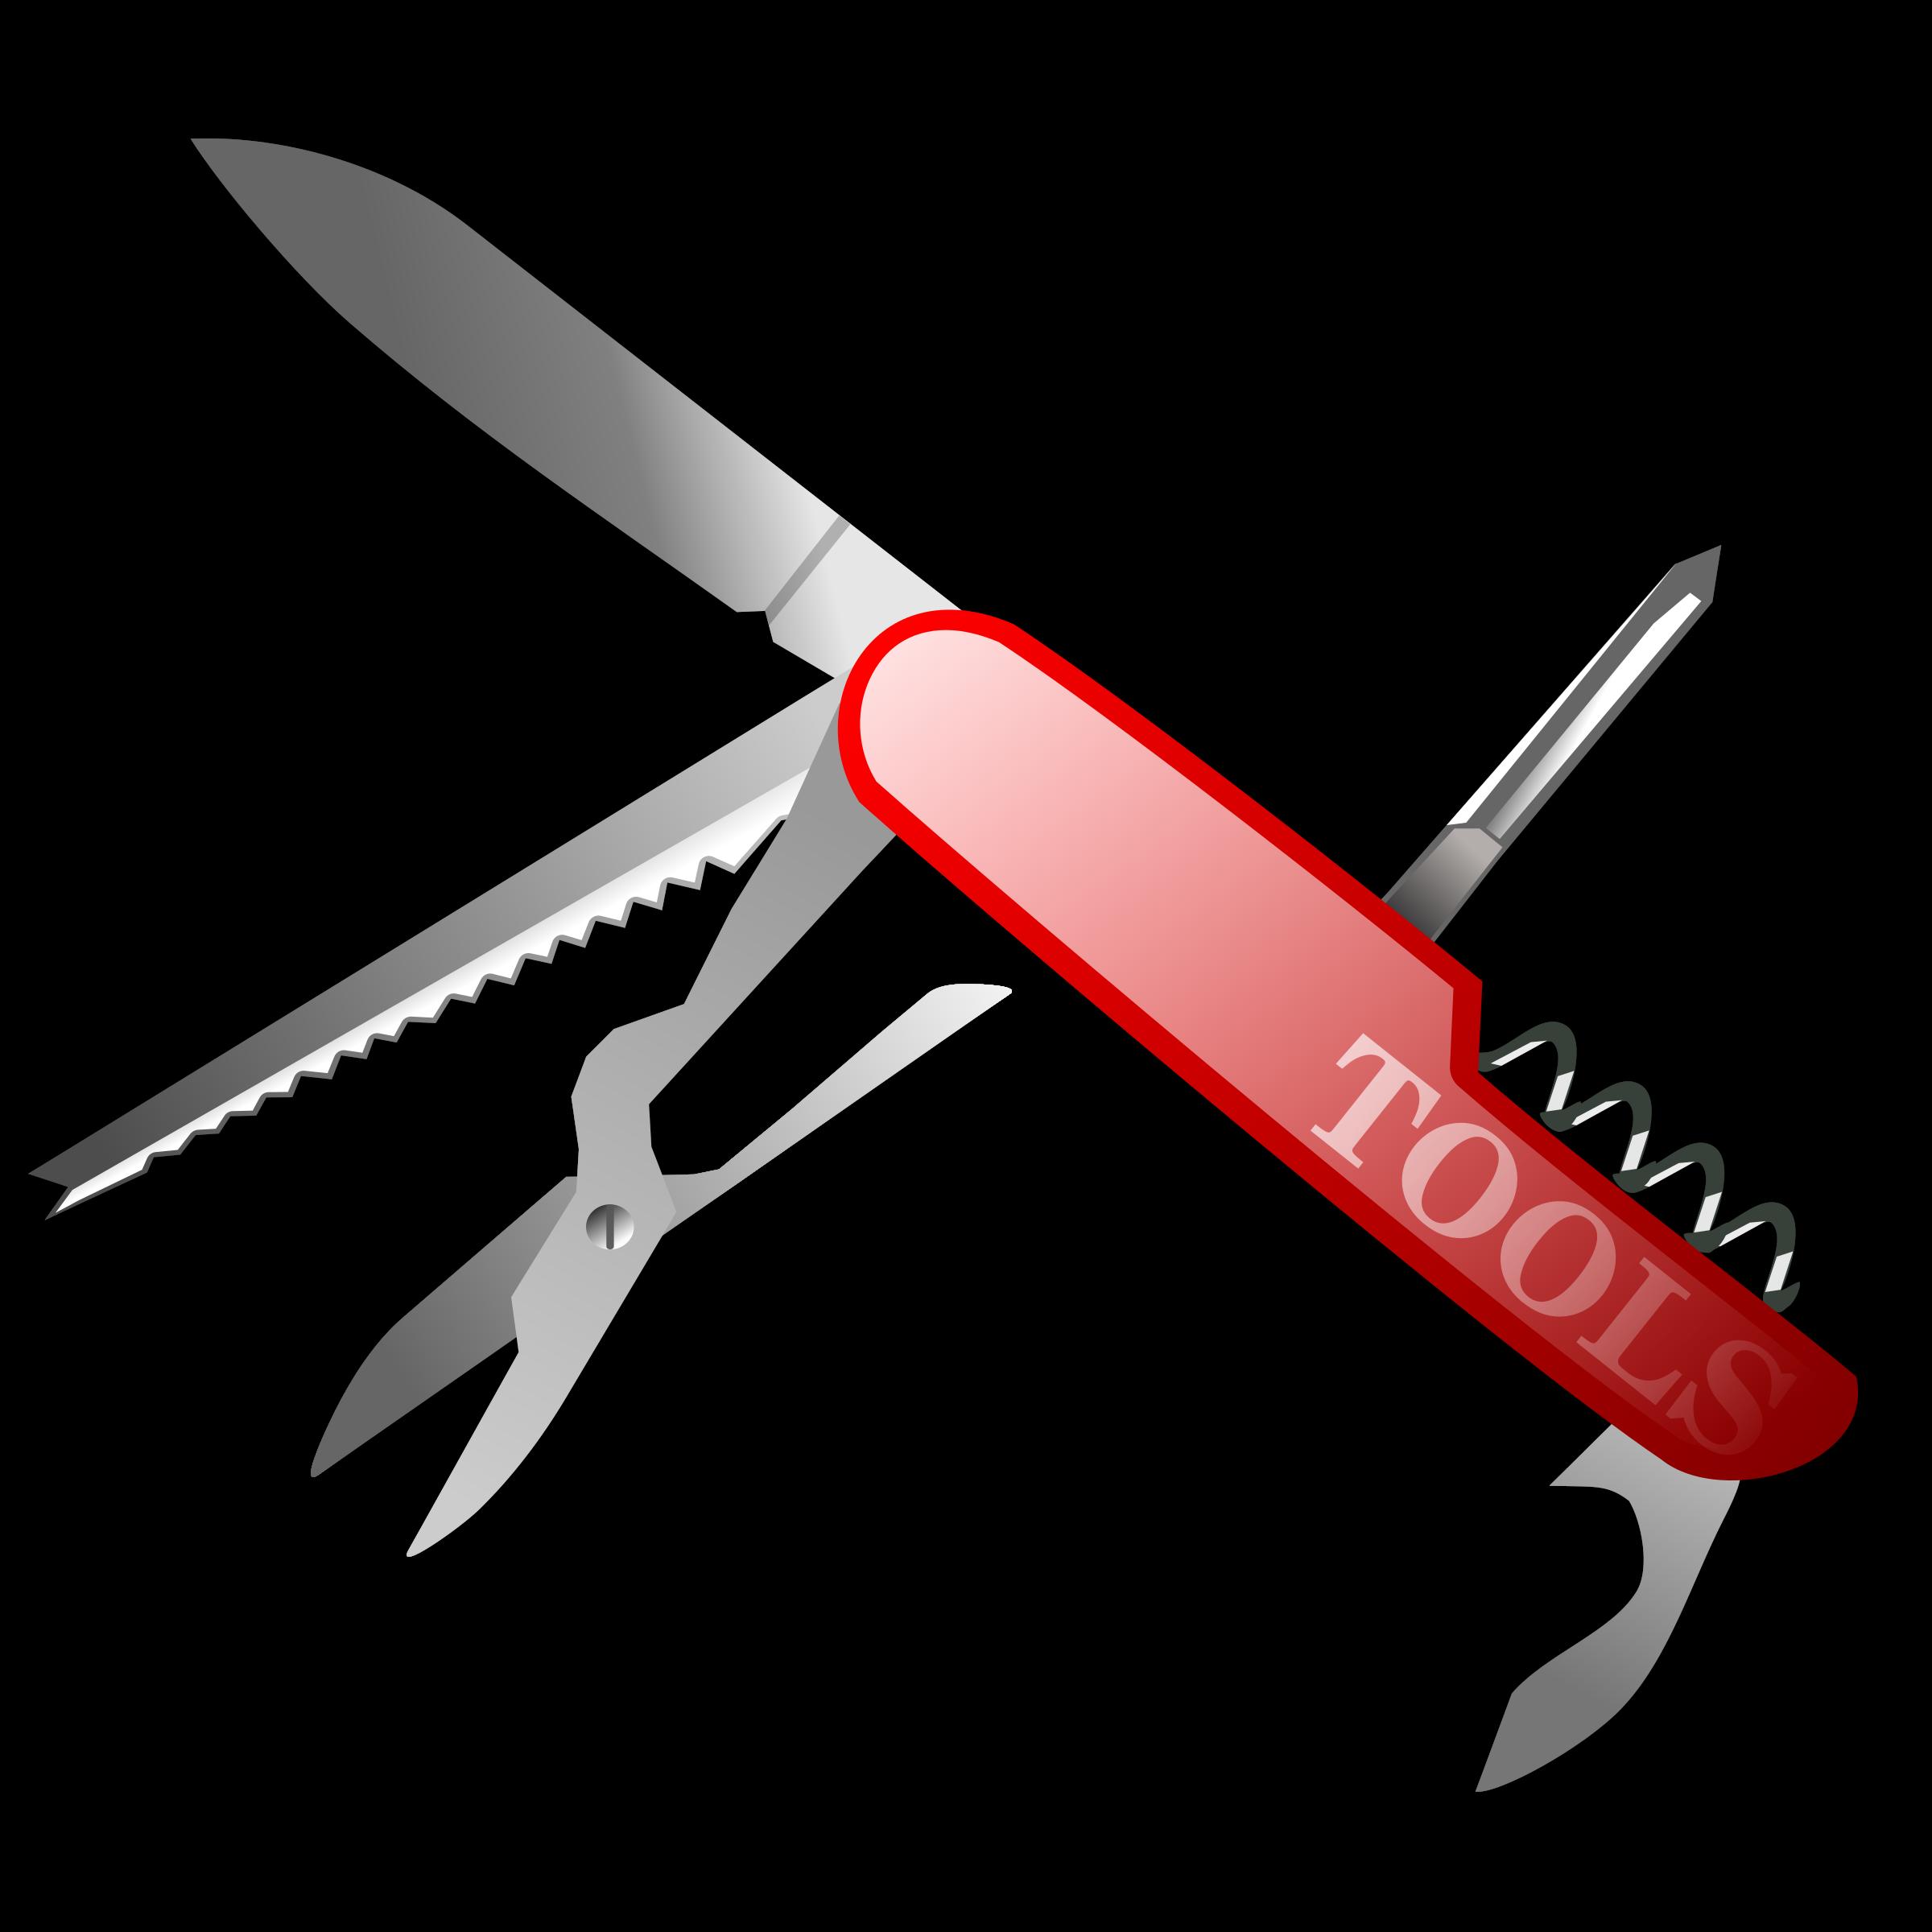 Knife clipart hand. Swiss army clip art